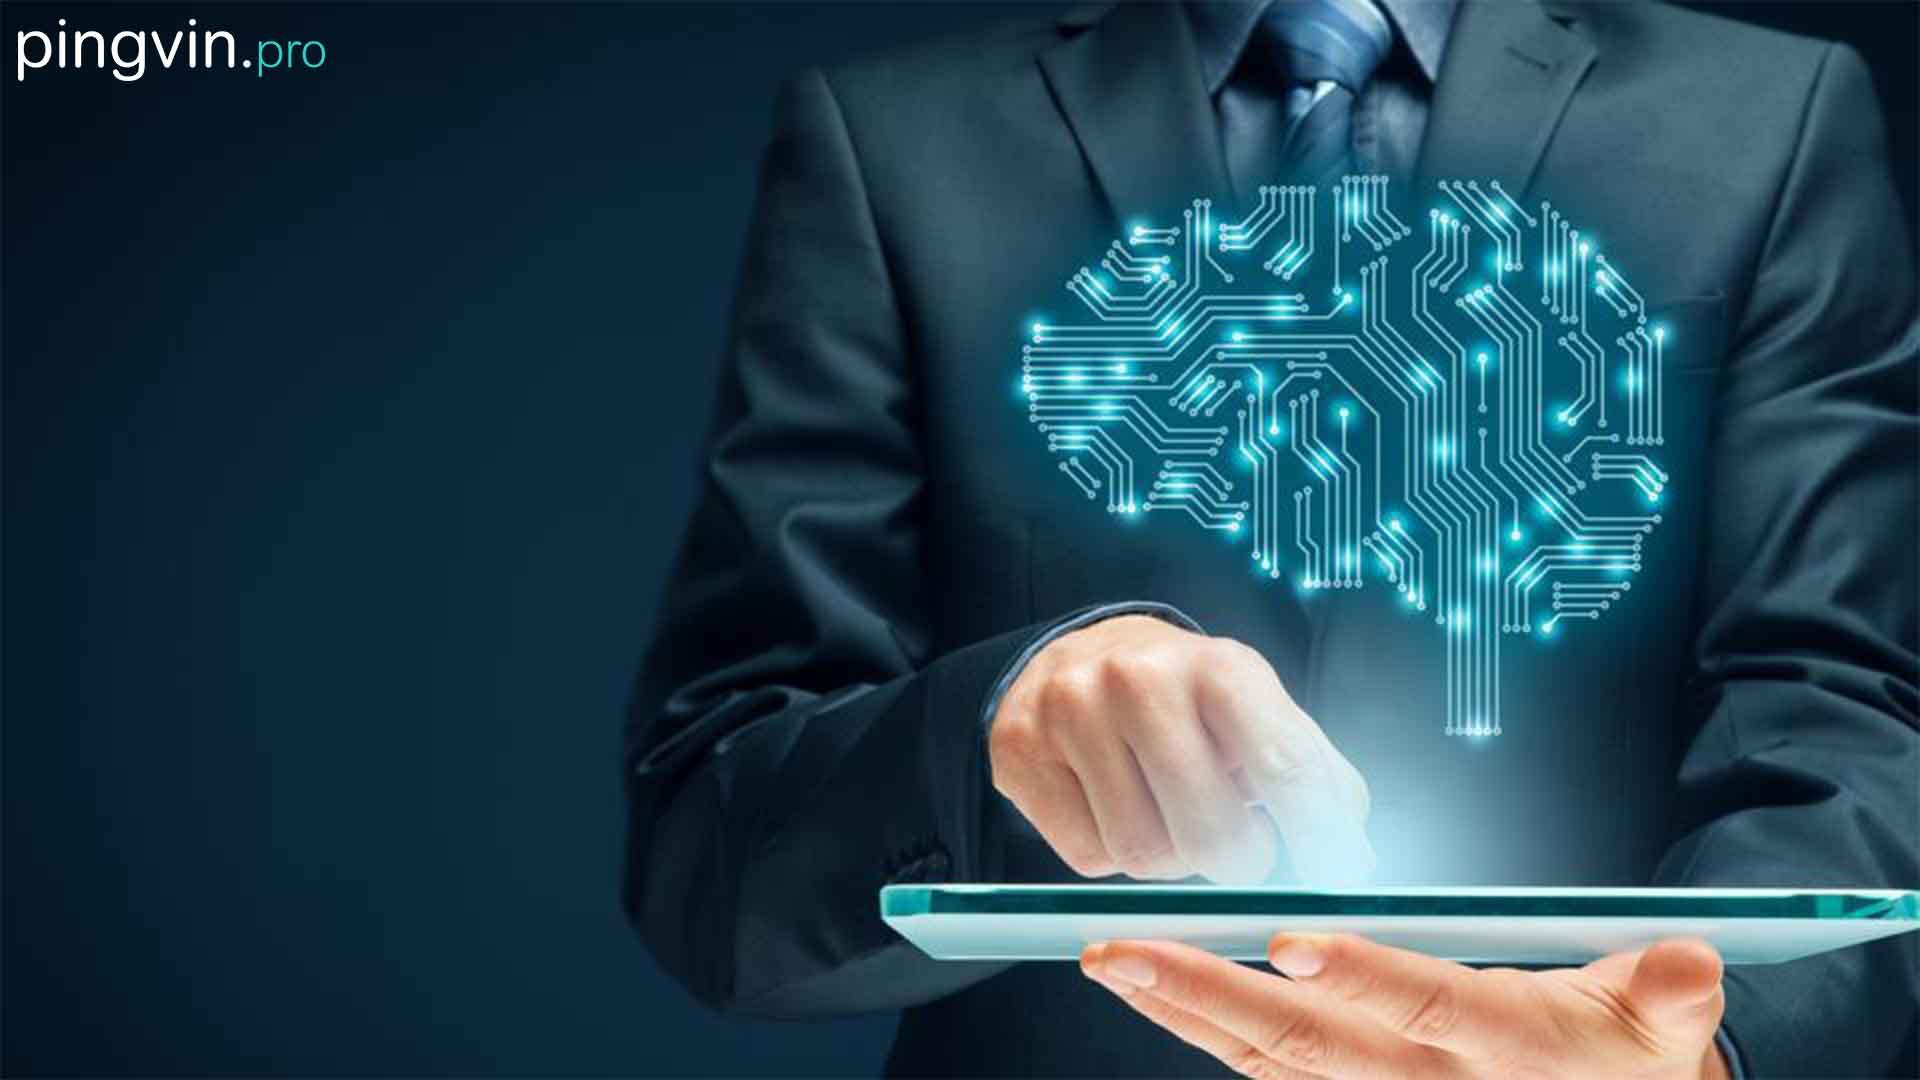 штучним інтелектом / штучний інтелект / штучного інтелекту